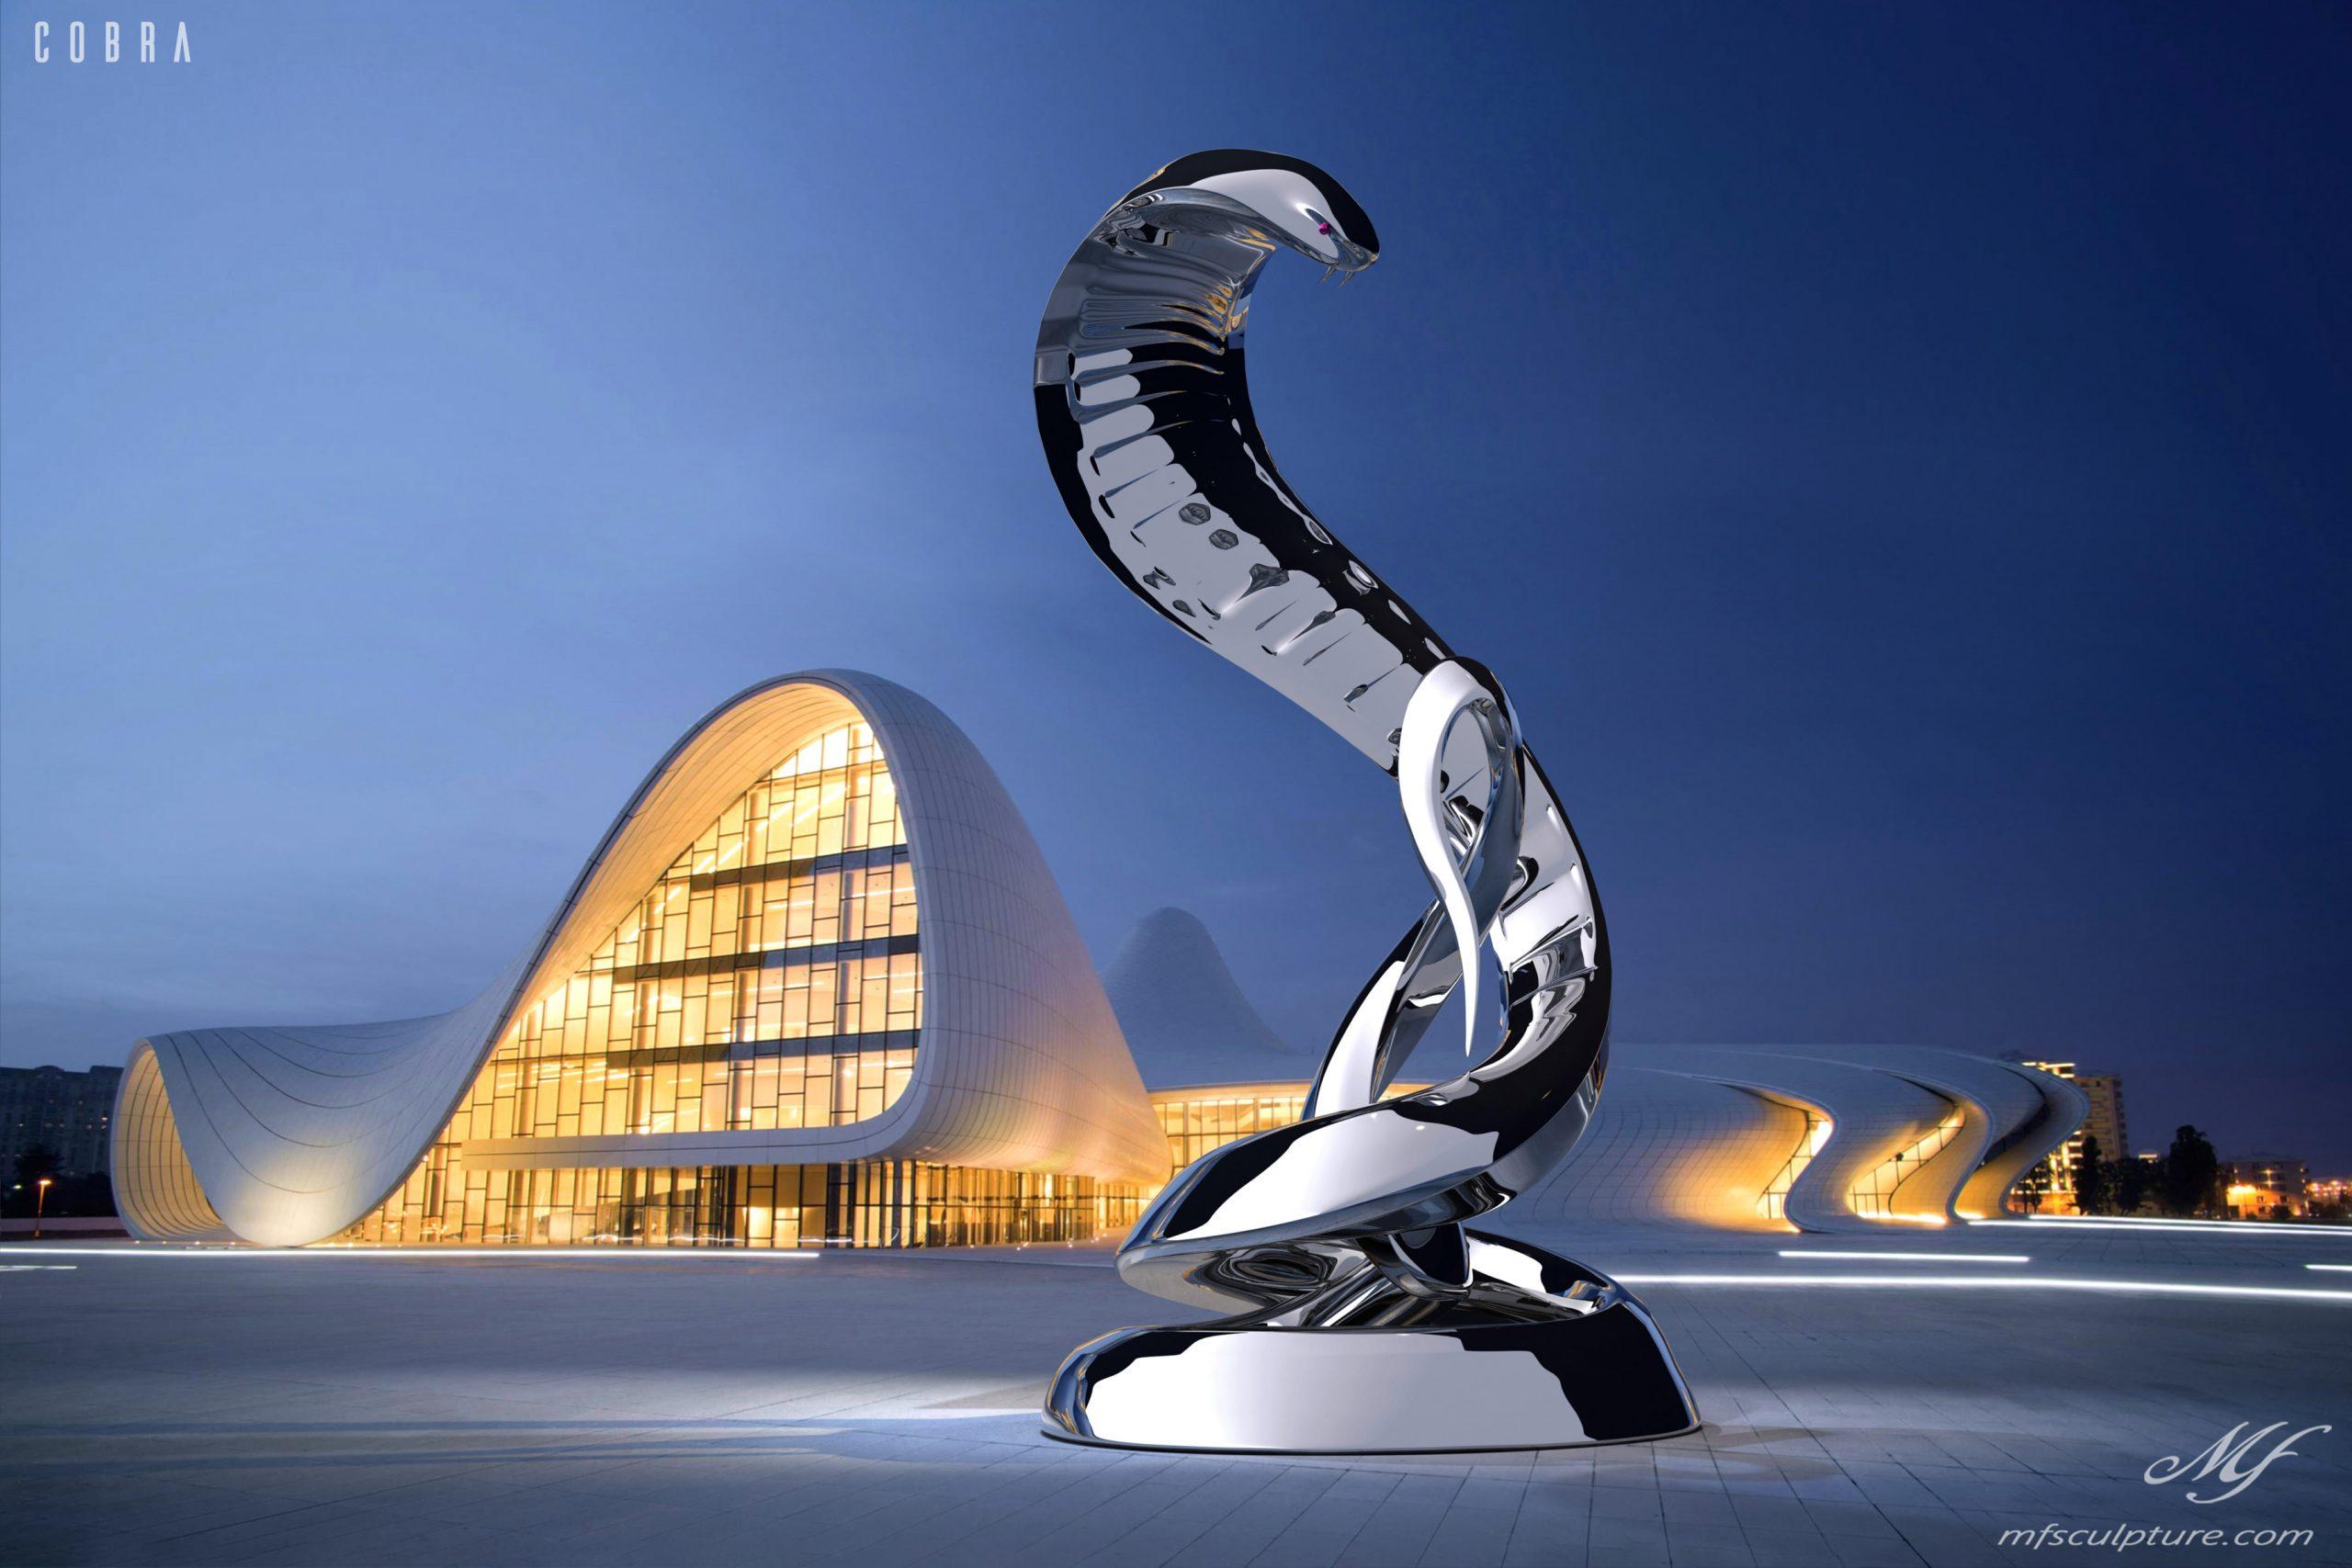 Heydar Aliyev Zaha Hadid Modern Sculpture Cobra2 1